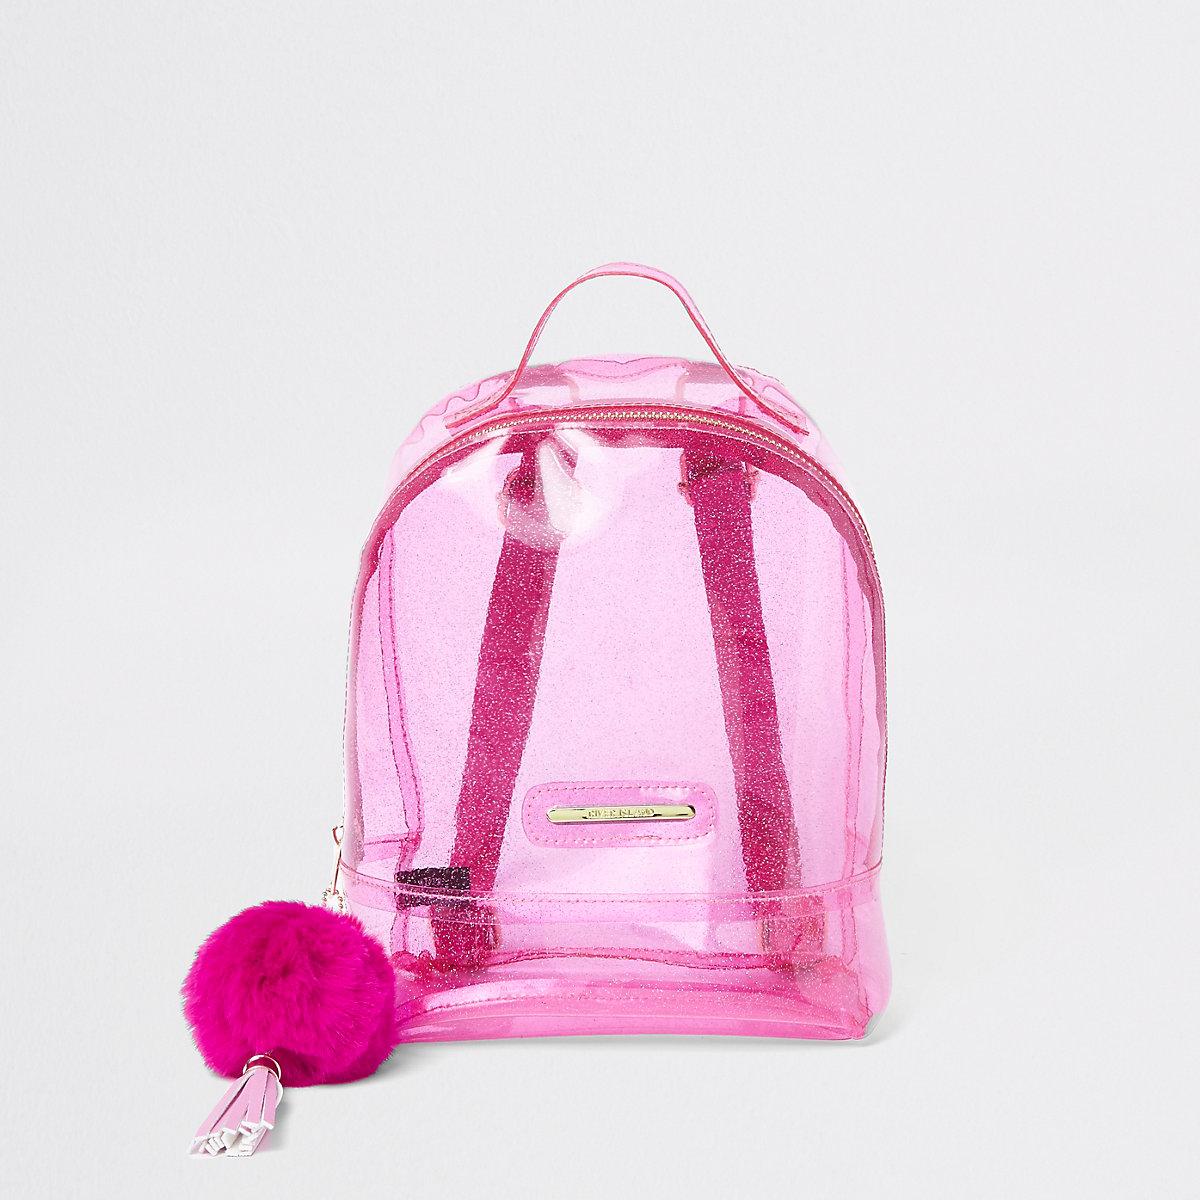 daebf576d6e1 Girls pink glitter jelly backpack - Backpacks - Bags   Purses - girls